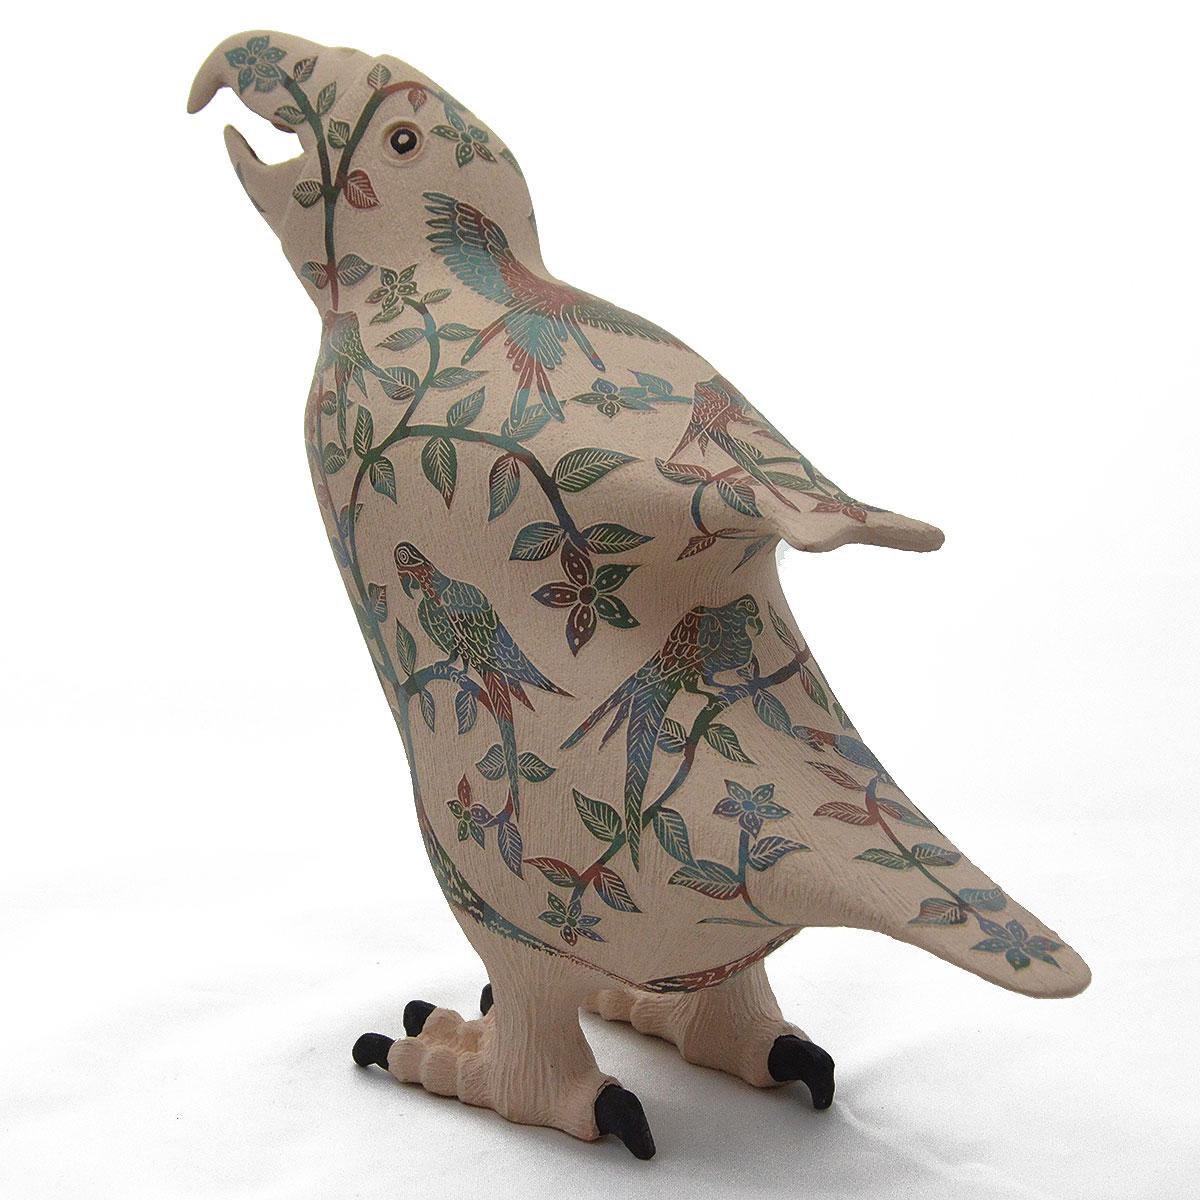 Nicolas Ortiz Jr.: Sgraffito Macaw Effigy